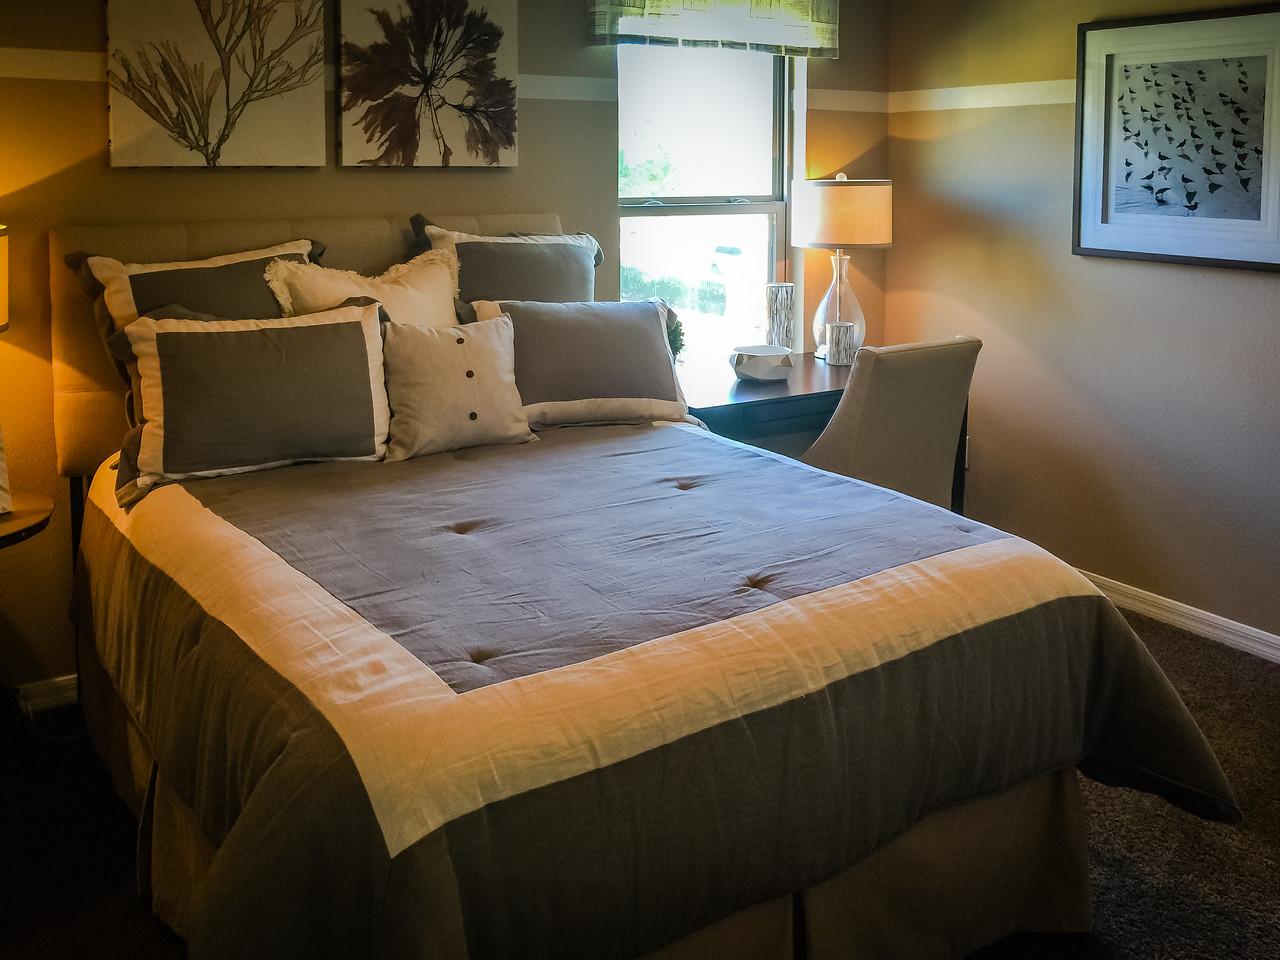 Yardley Bedroom 2